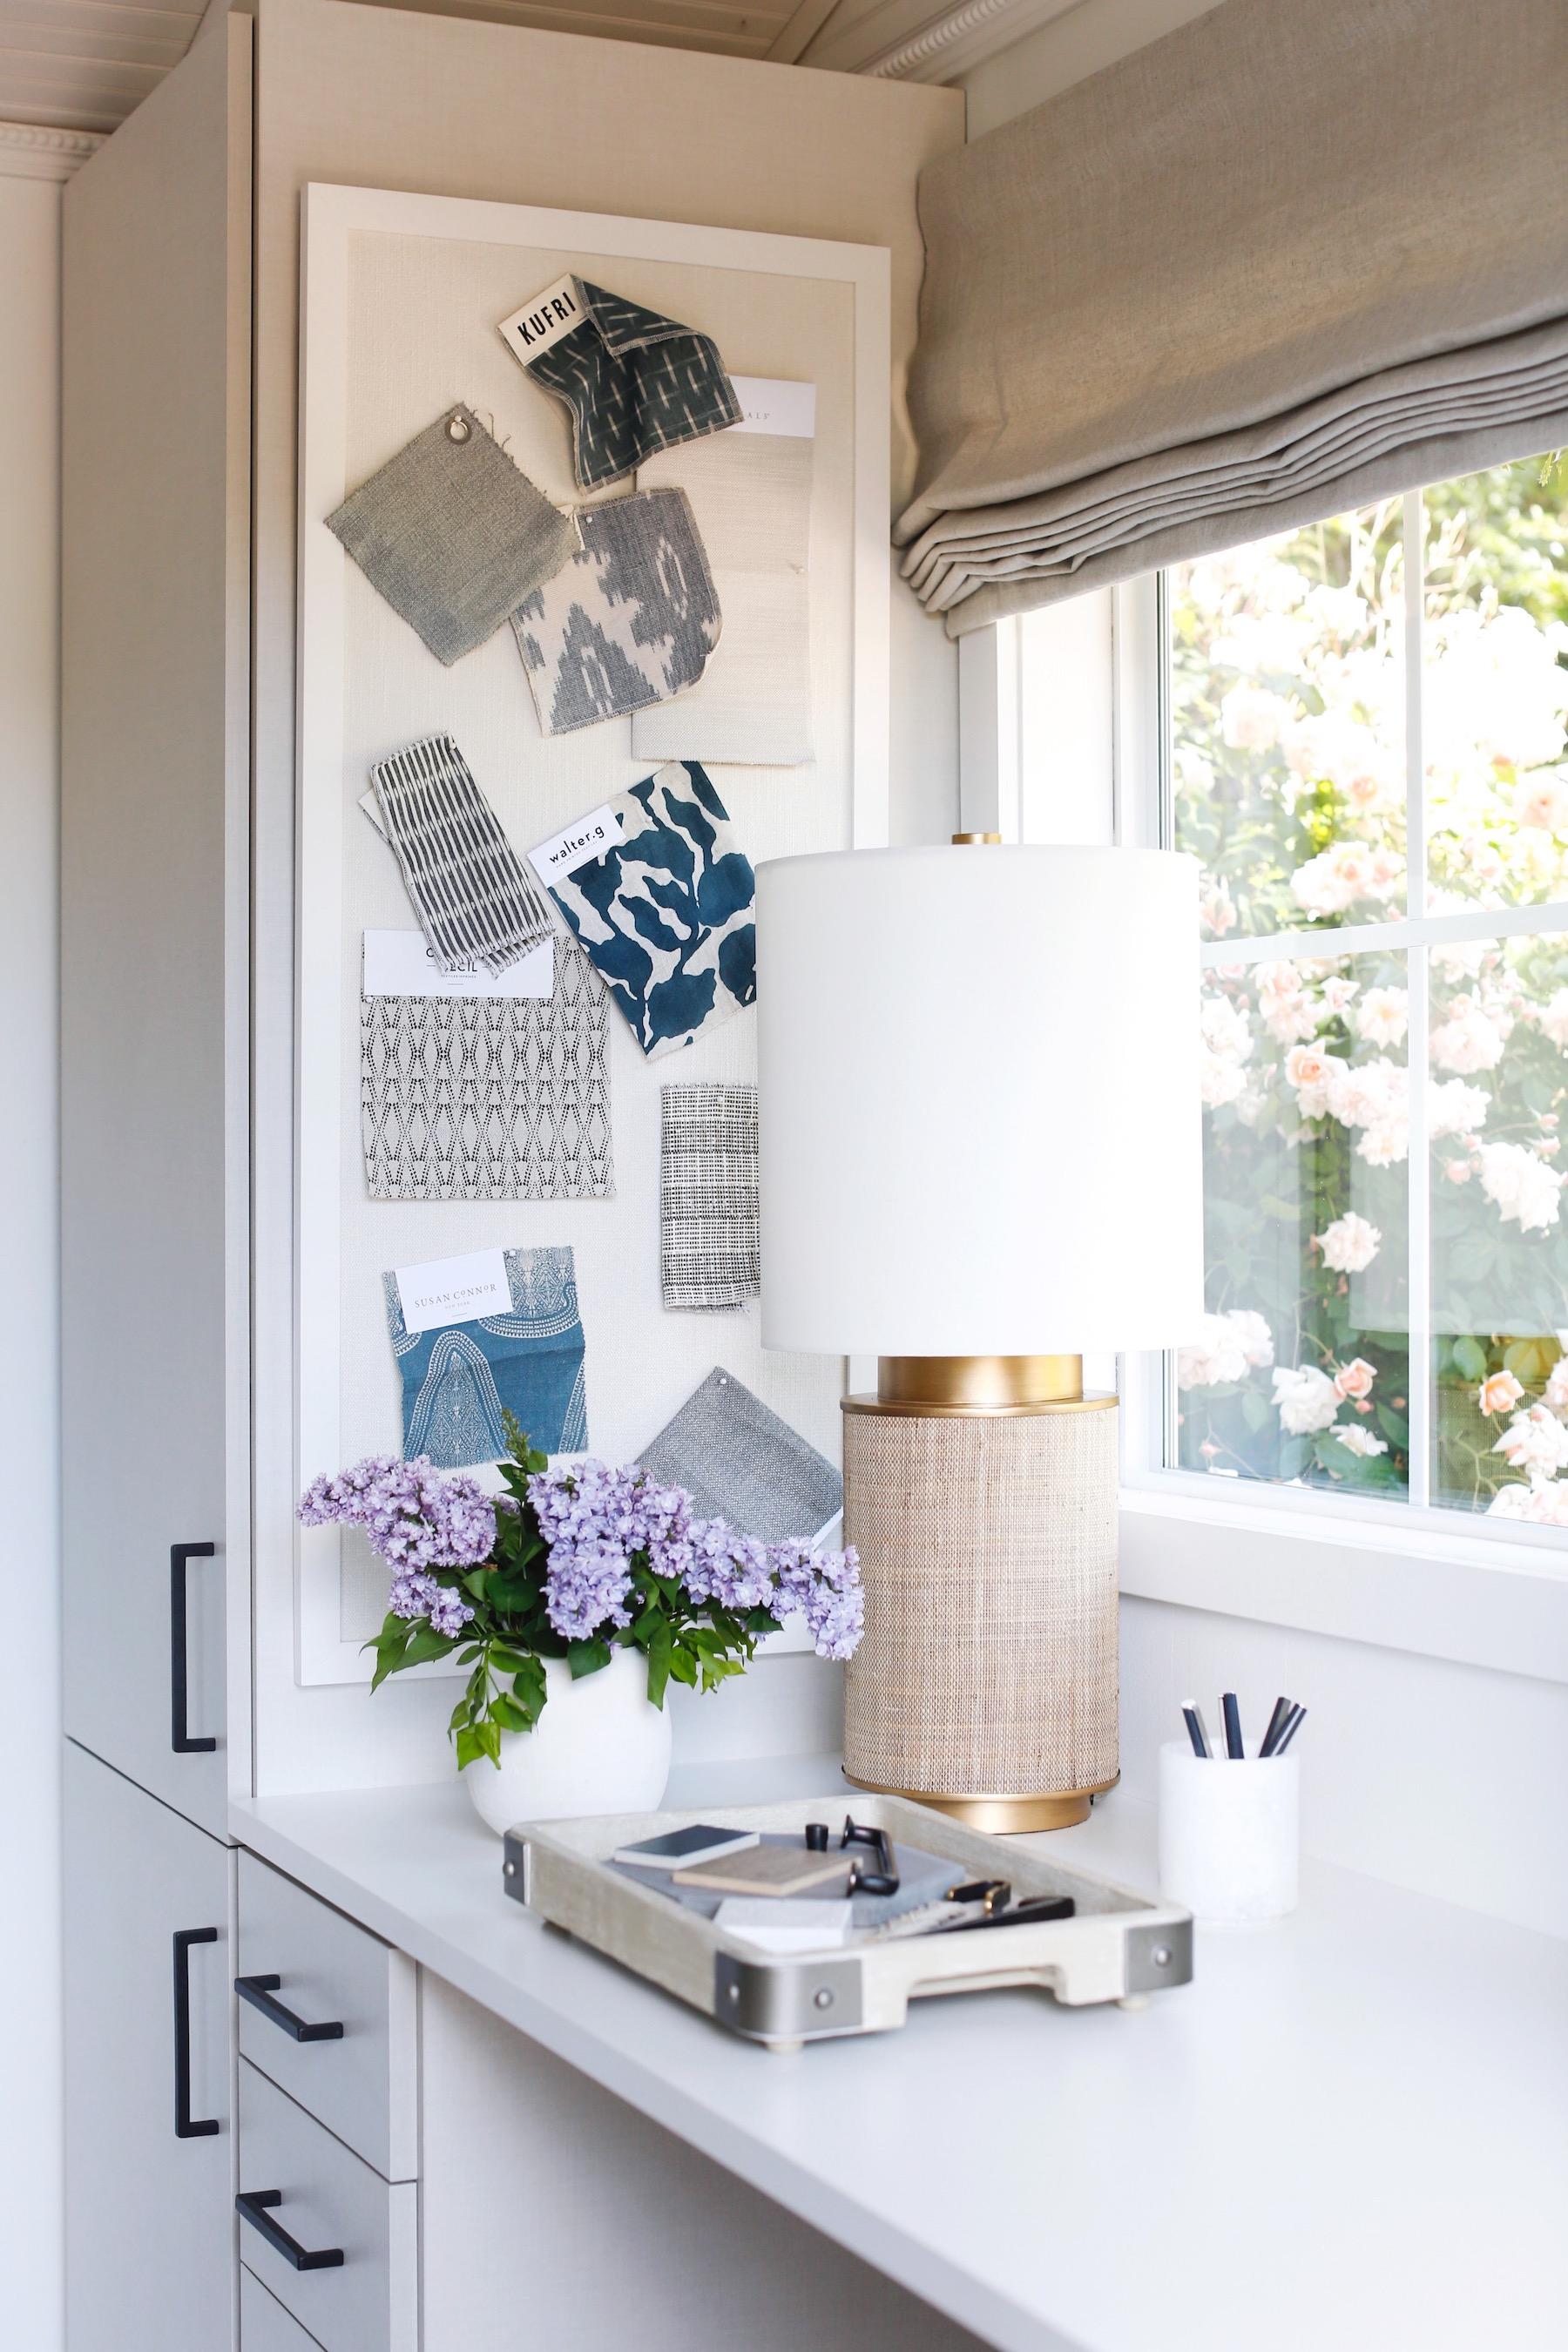 crystal palecek s marin county interior design studio rue